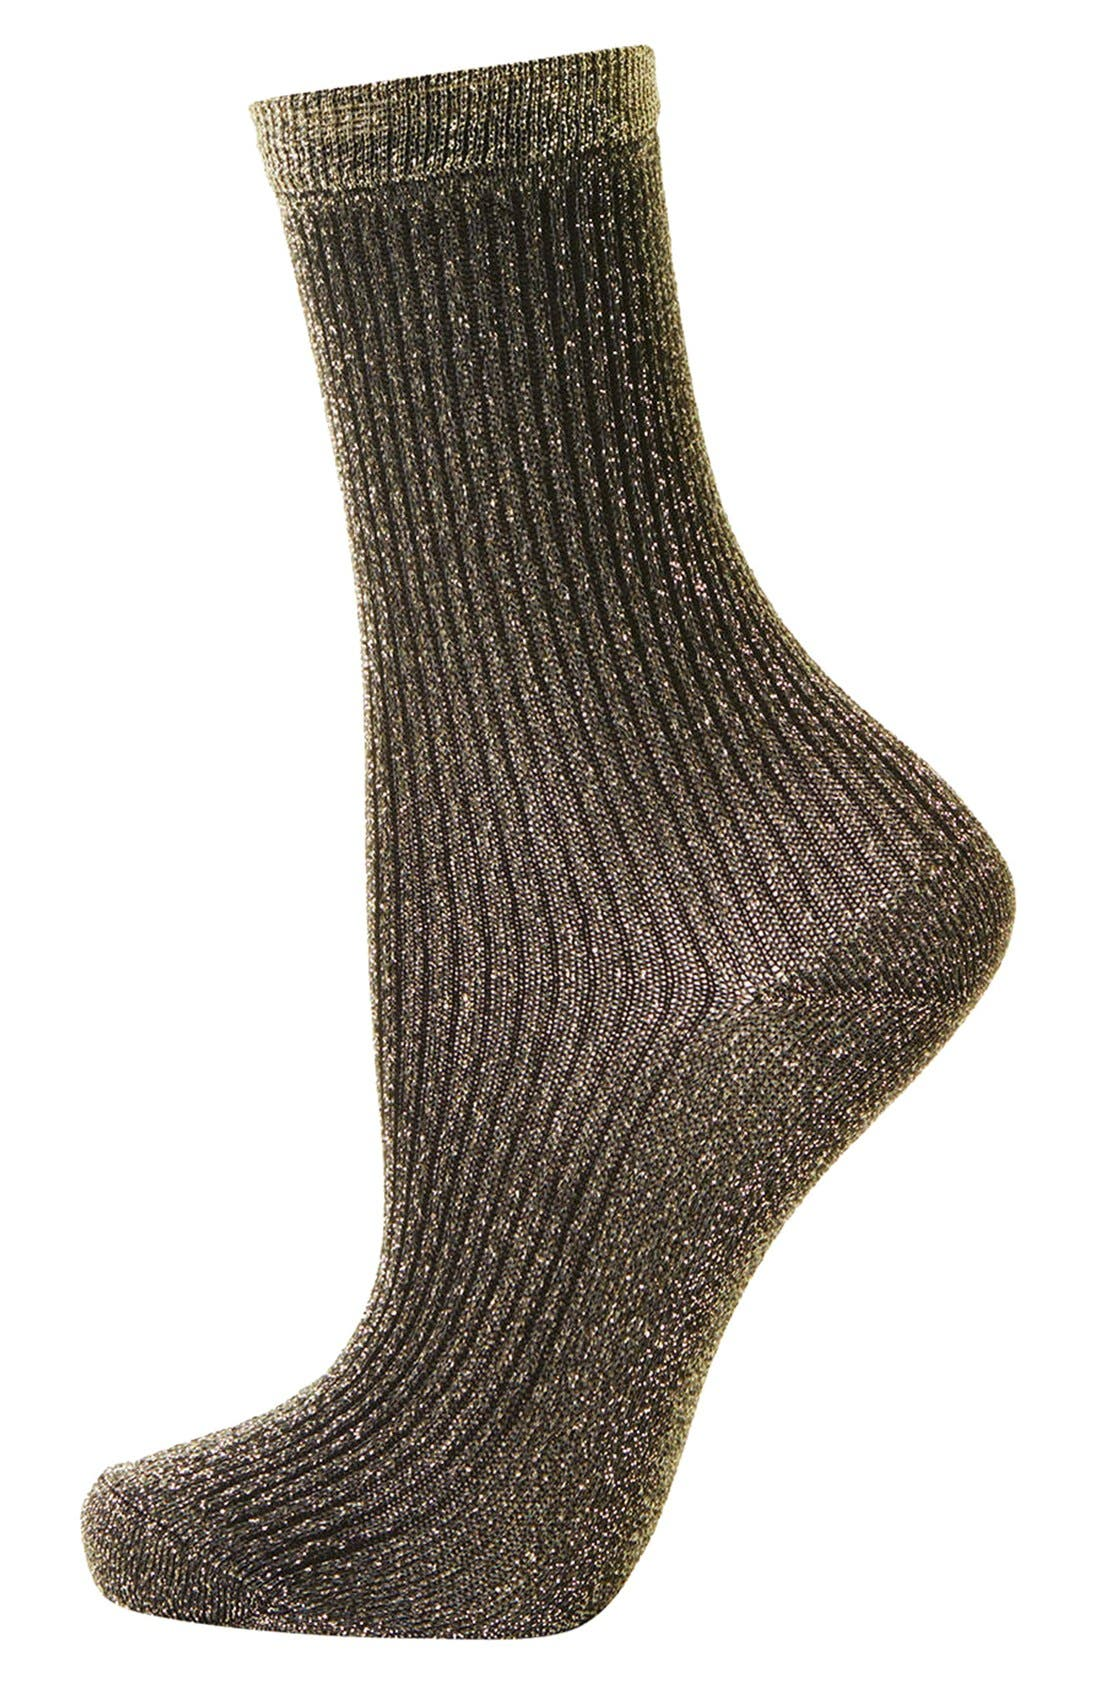 Alternate Image 1 Selected - Topshop Ribbed Glitter Ankle Socks